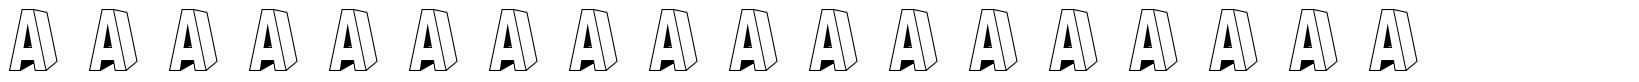 A Ryal Black Block font